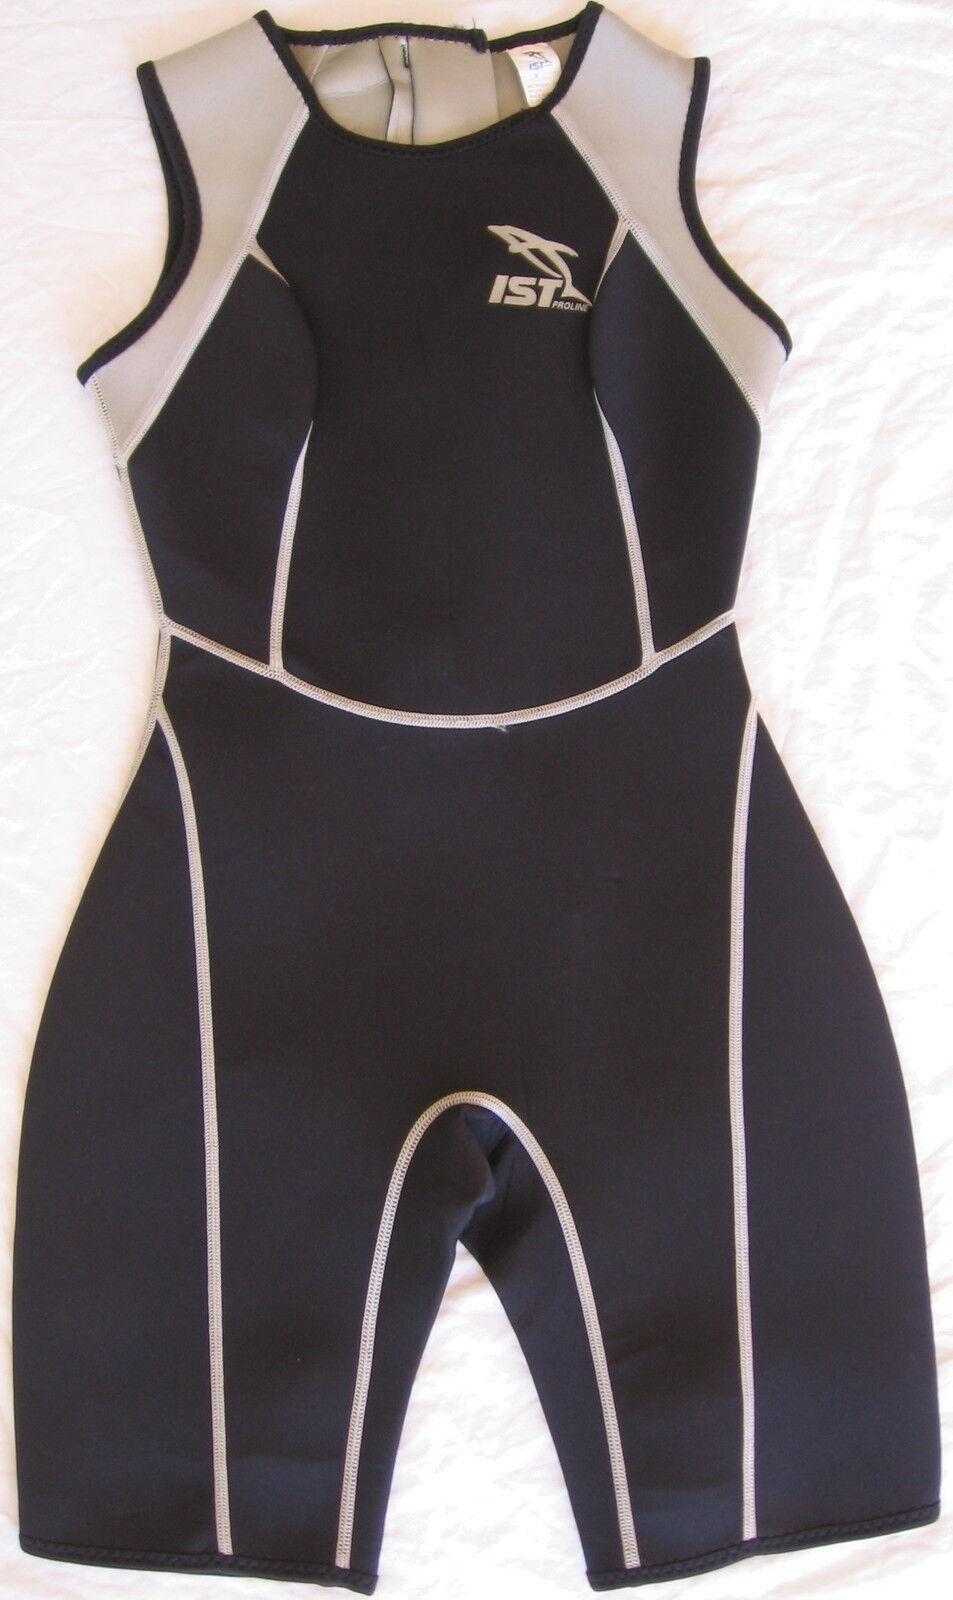 IST  Scuba Snorkeling Surfing Shorty 3mm Lady Size3 Neop. II Titanium coatd  cheap wholesale